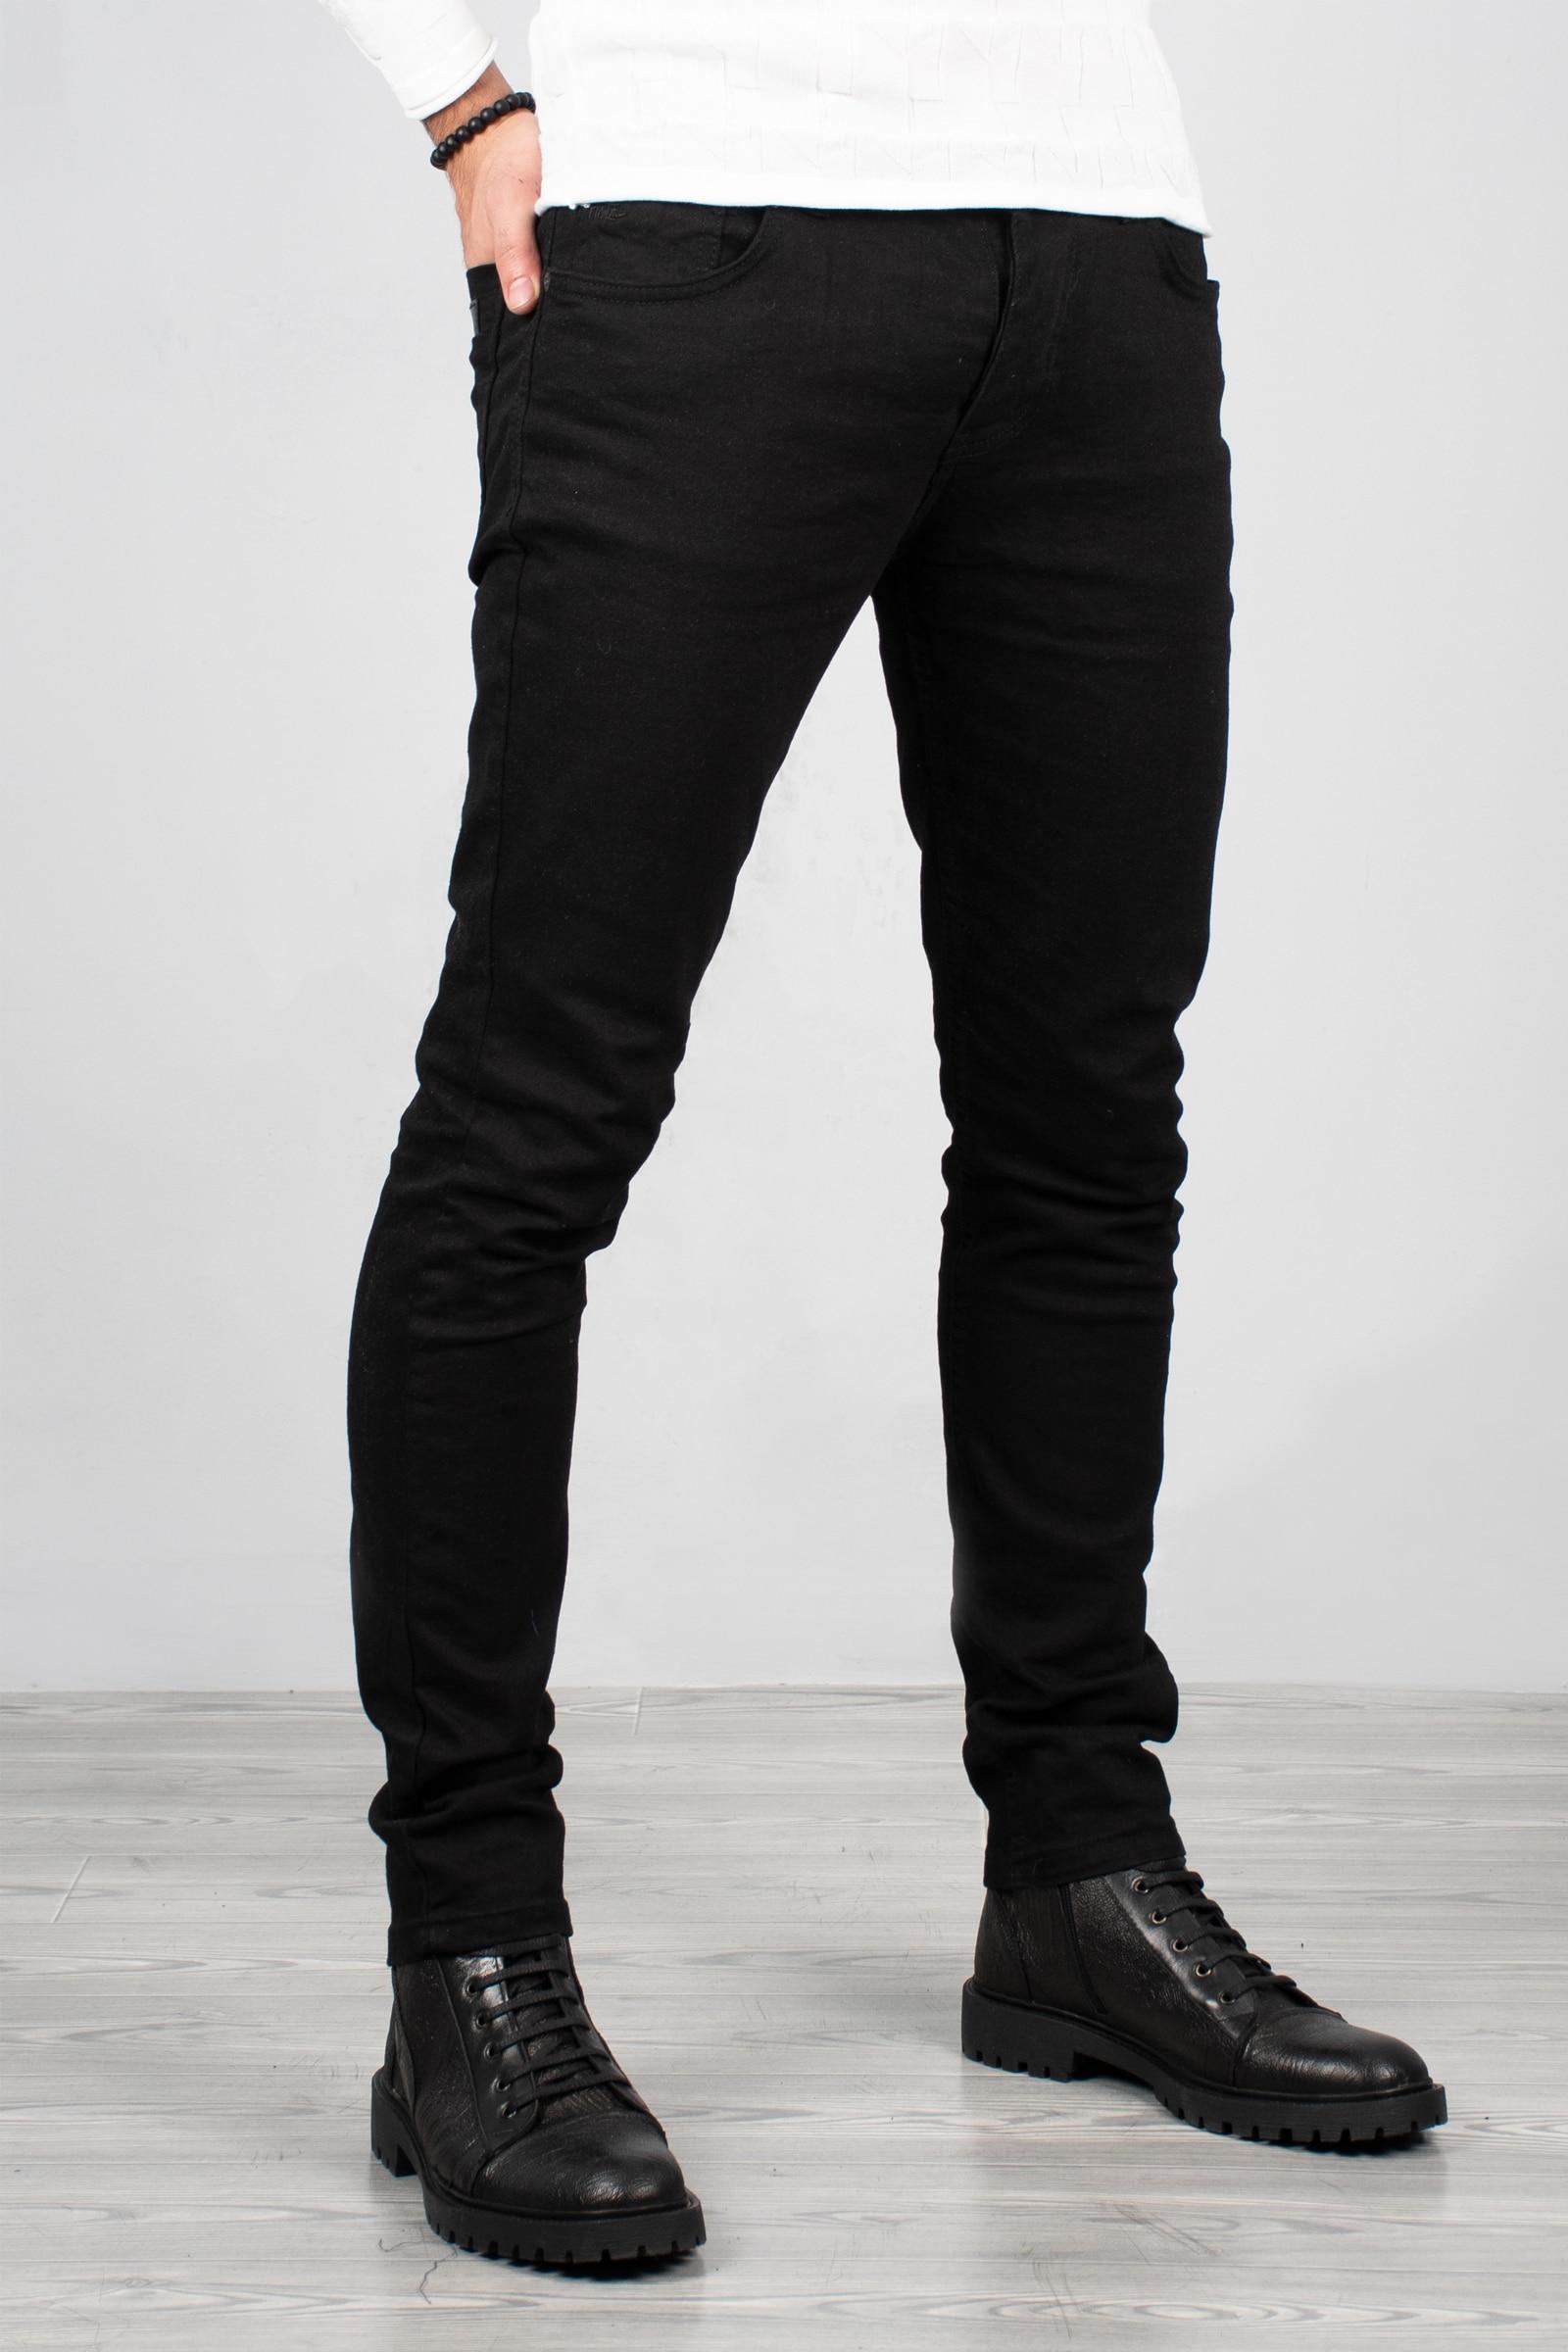 DeepSEA Male Black Slim Fit Jeans Denim Long Pants Slim Fit Cotton Lycra Street Clothing Four Seasons Vintage Casual 2001669